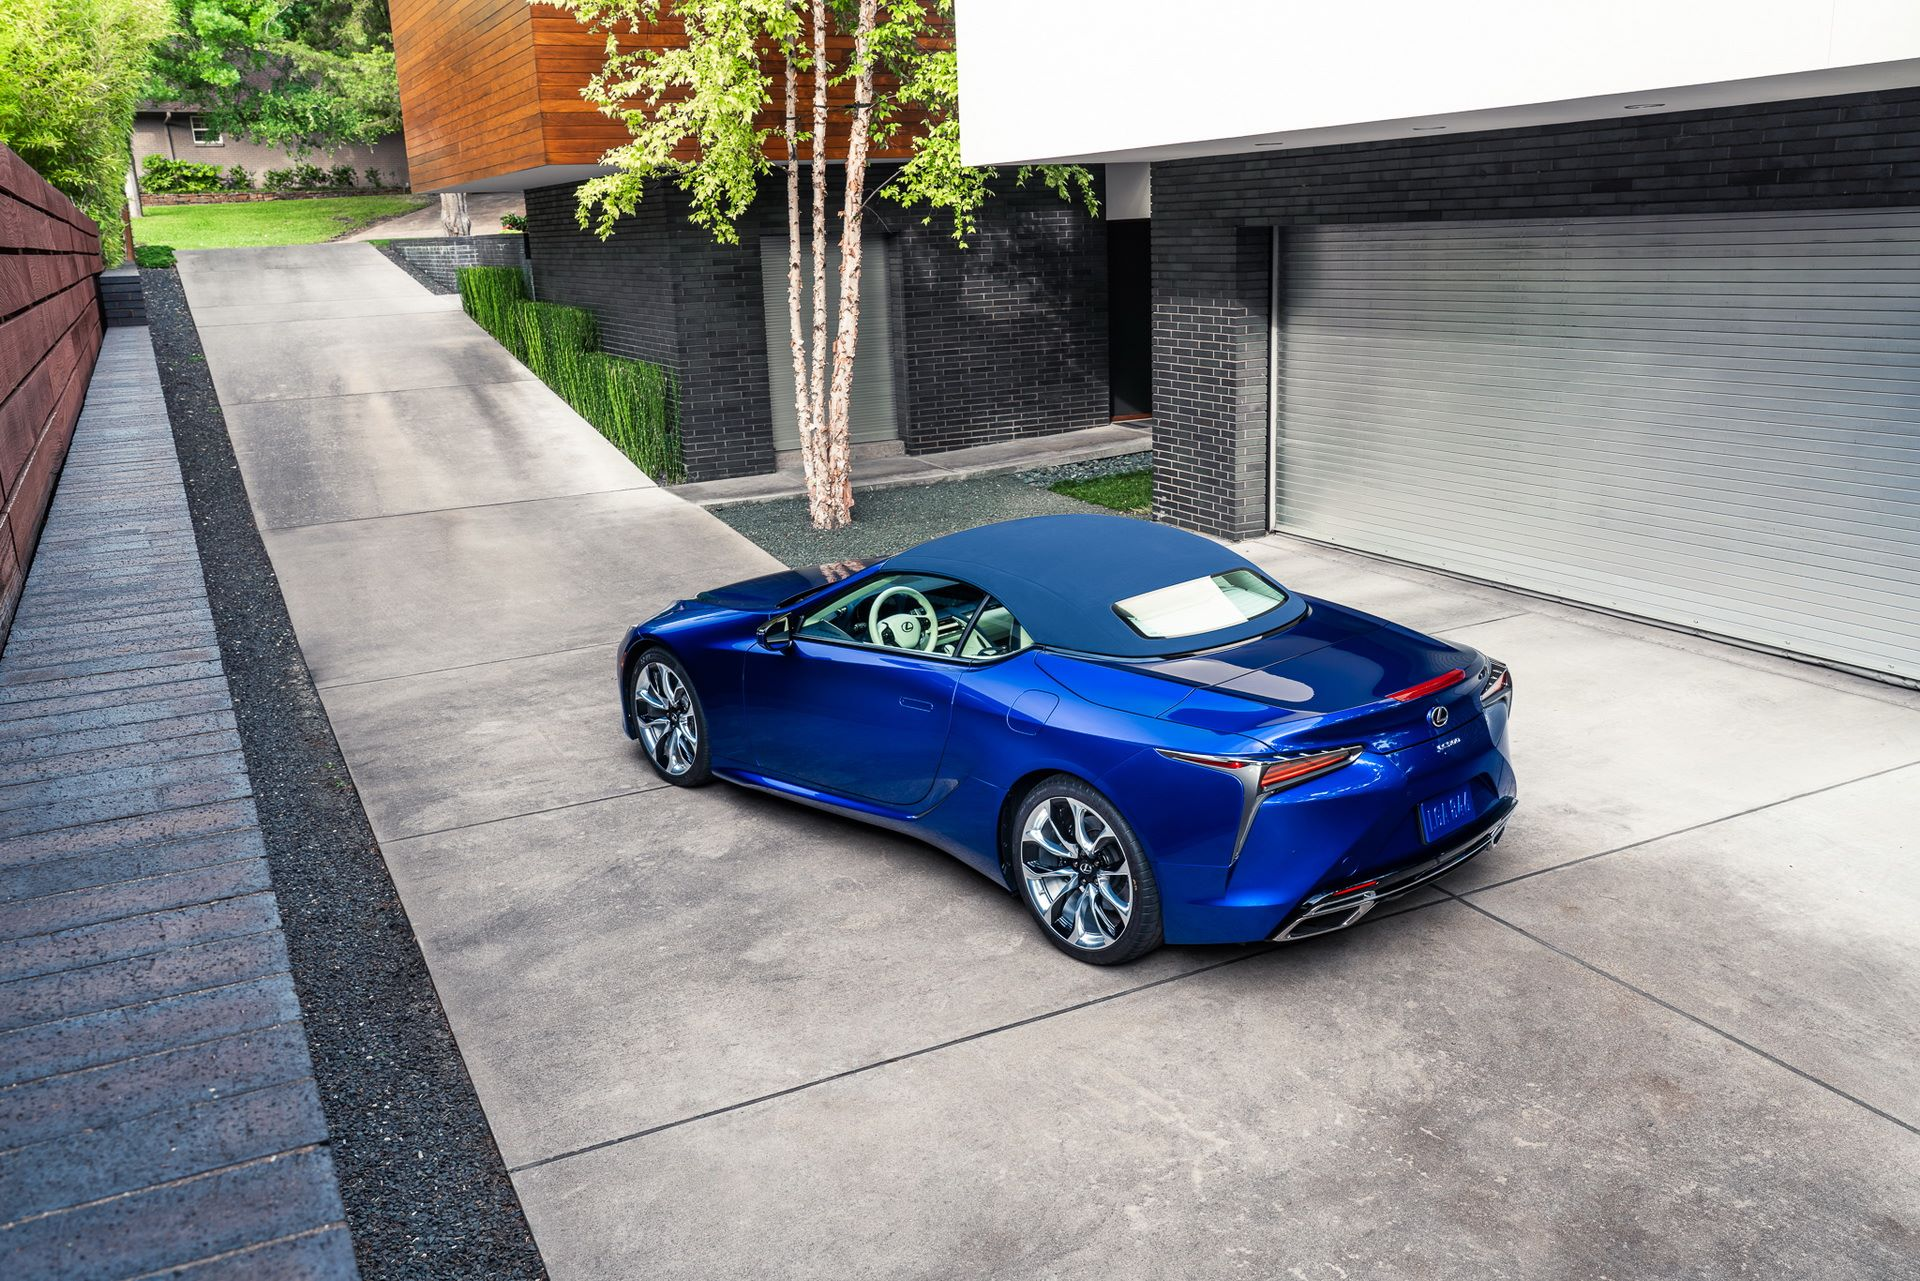 Lexus-LC-500-Convertible-Regatta-Edition-8